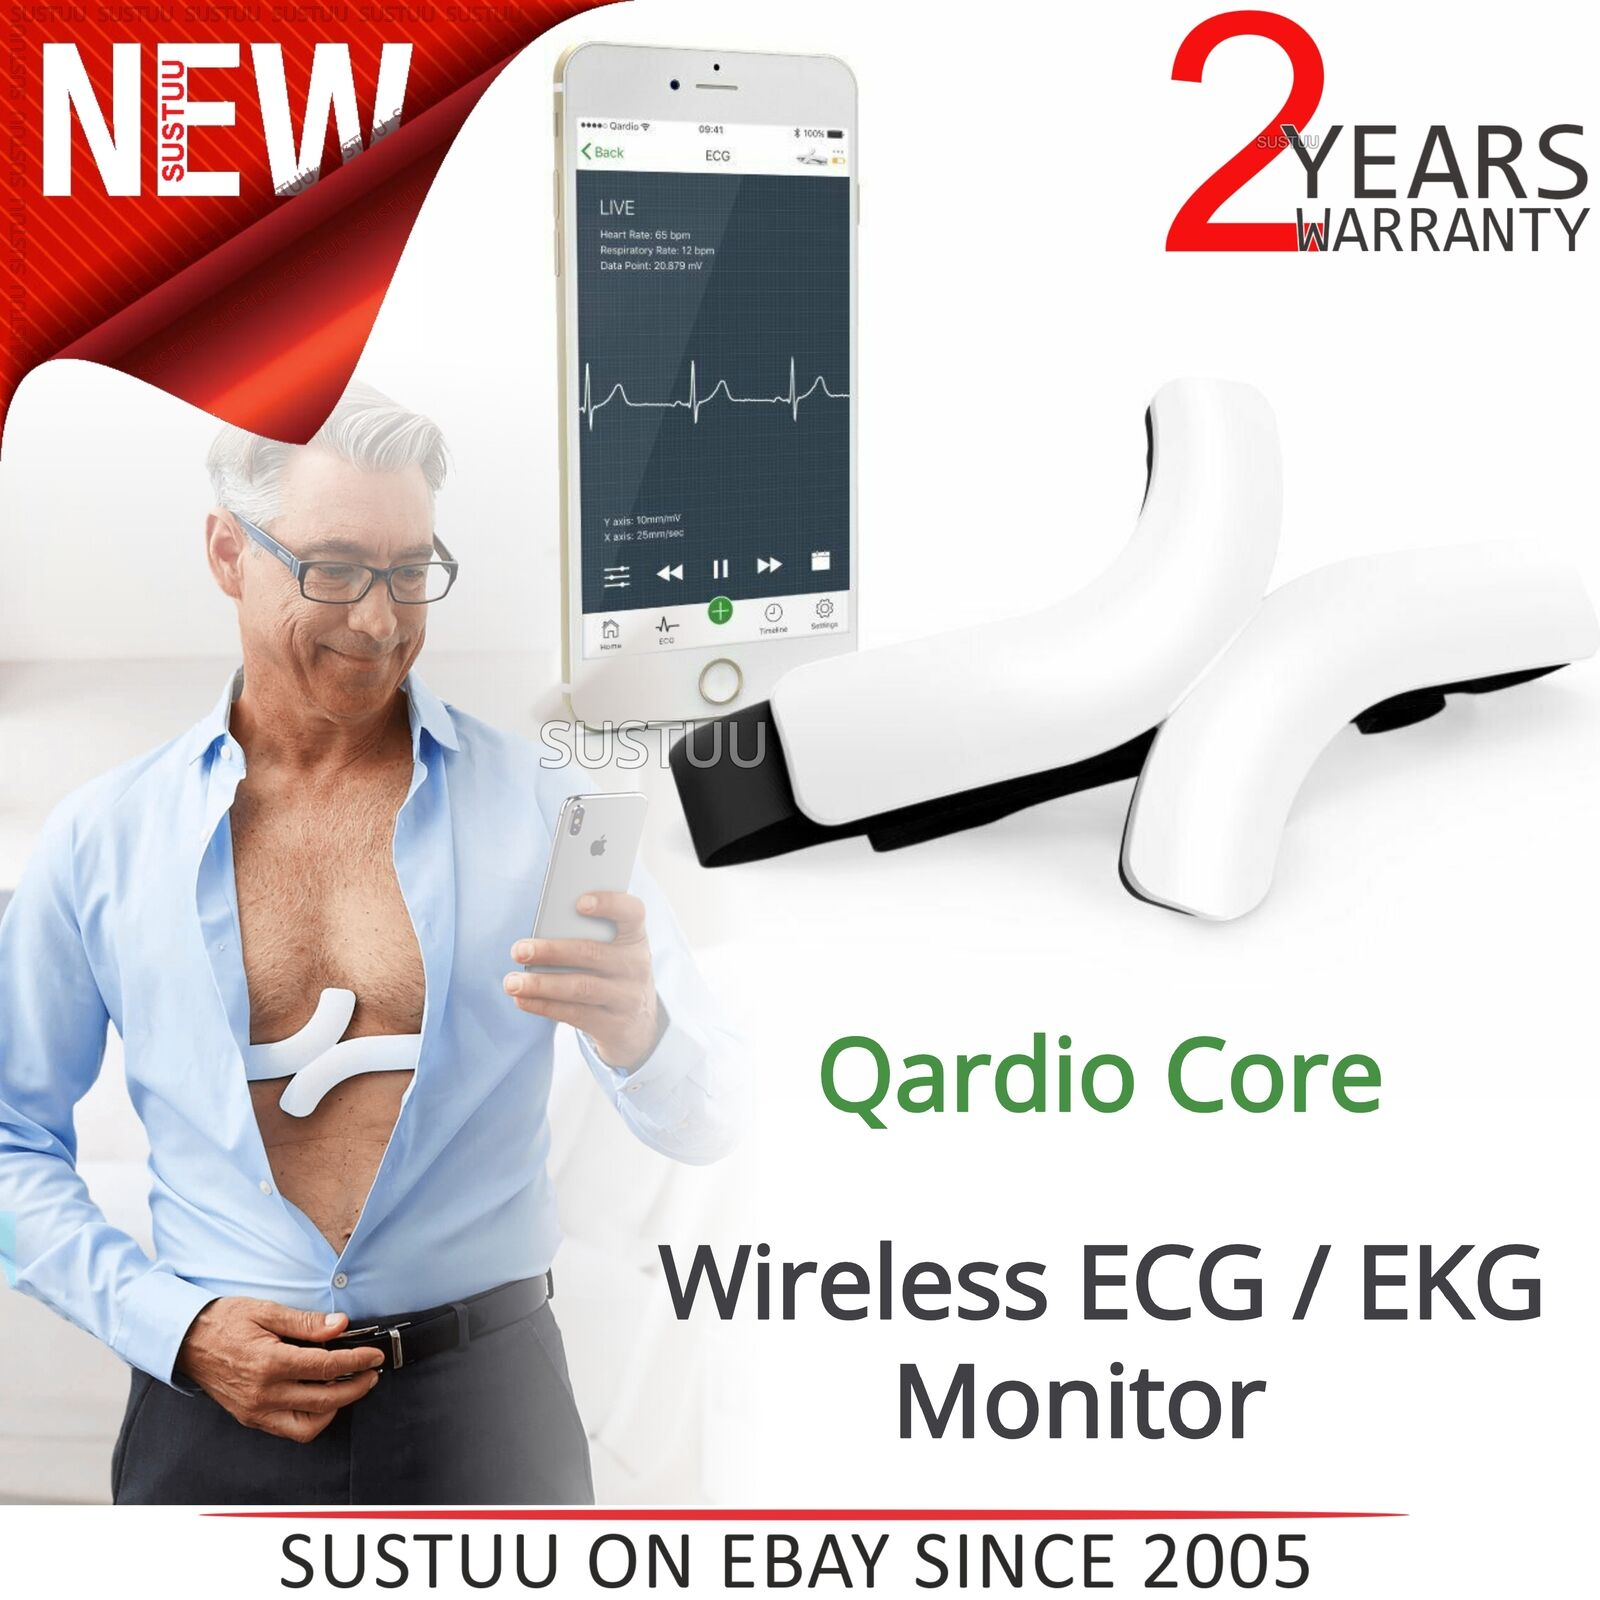 QardioCore Wireless ECG / EKG Mobile Monitor | Accurate Electrocardiograph Trace | NEW